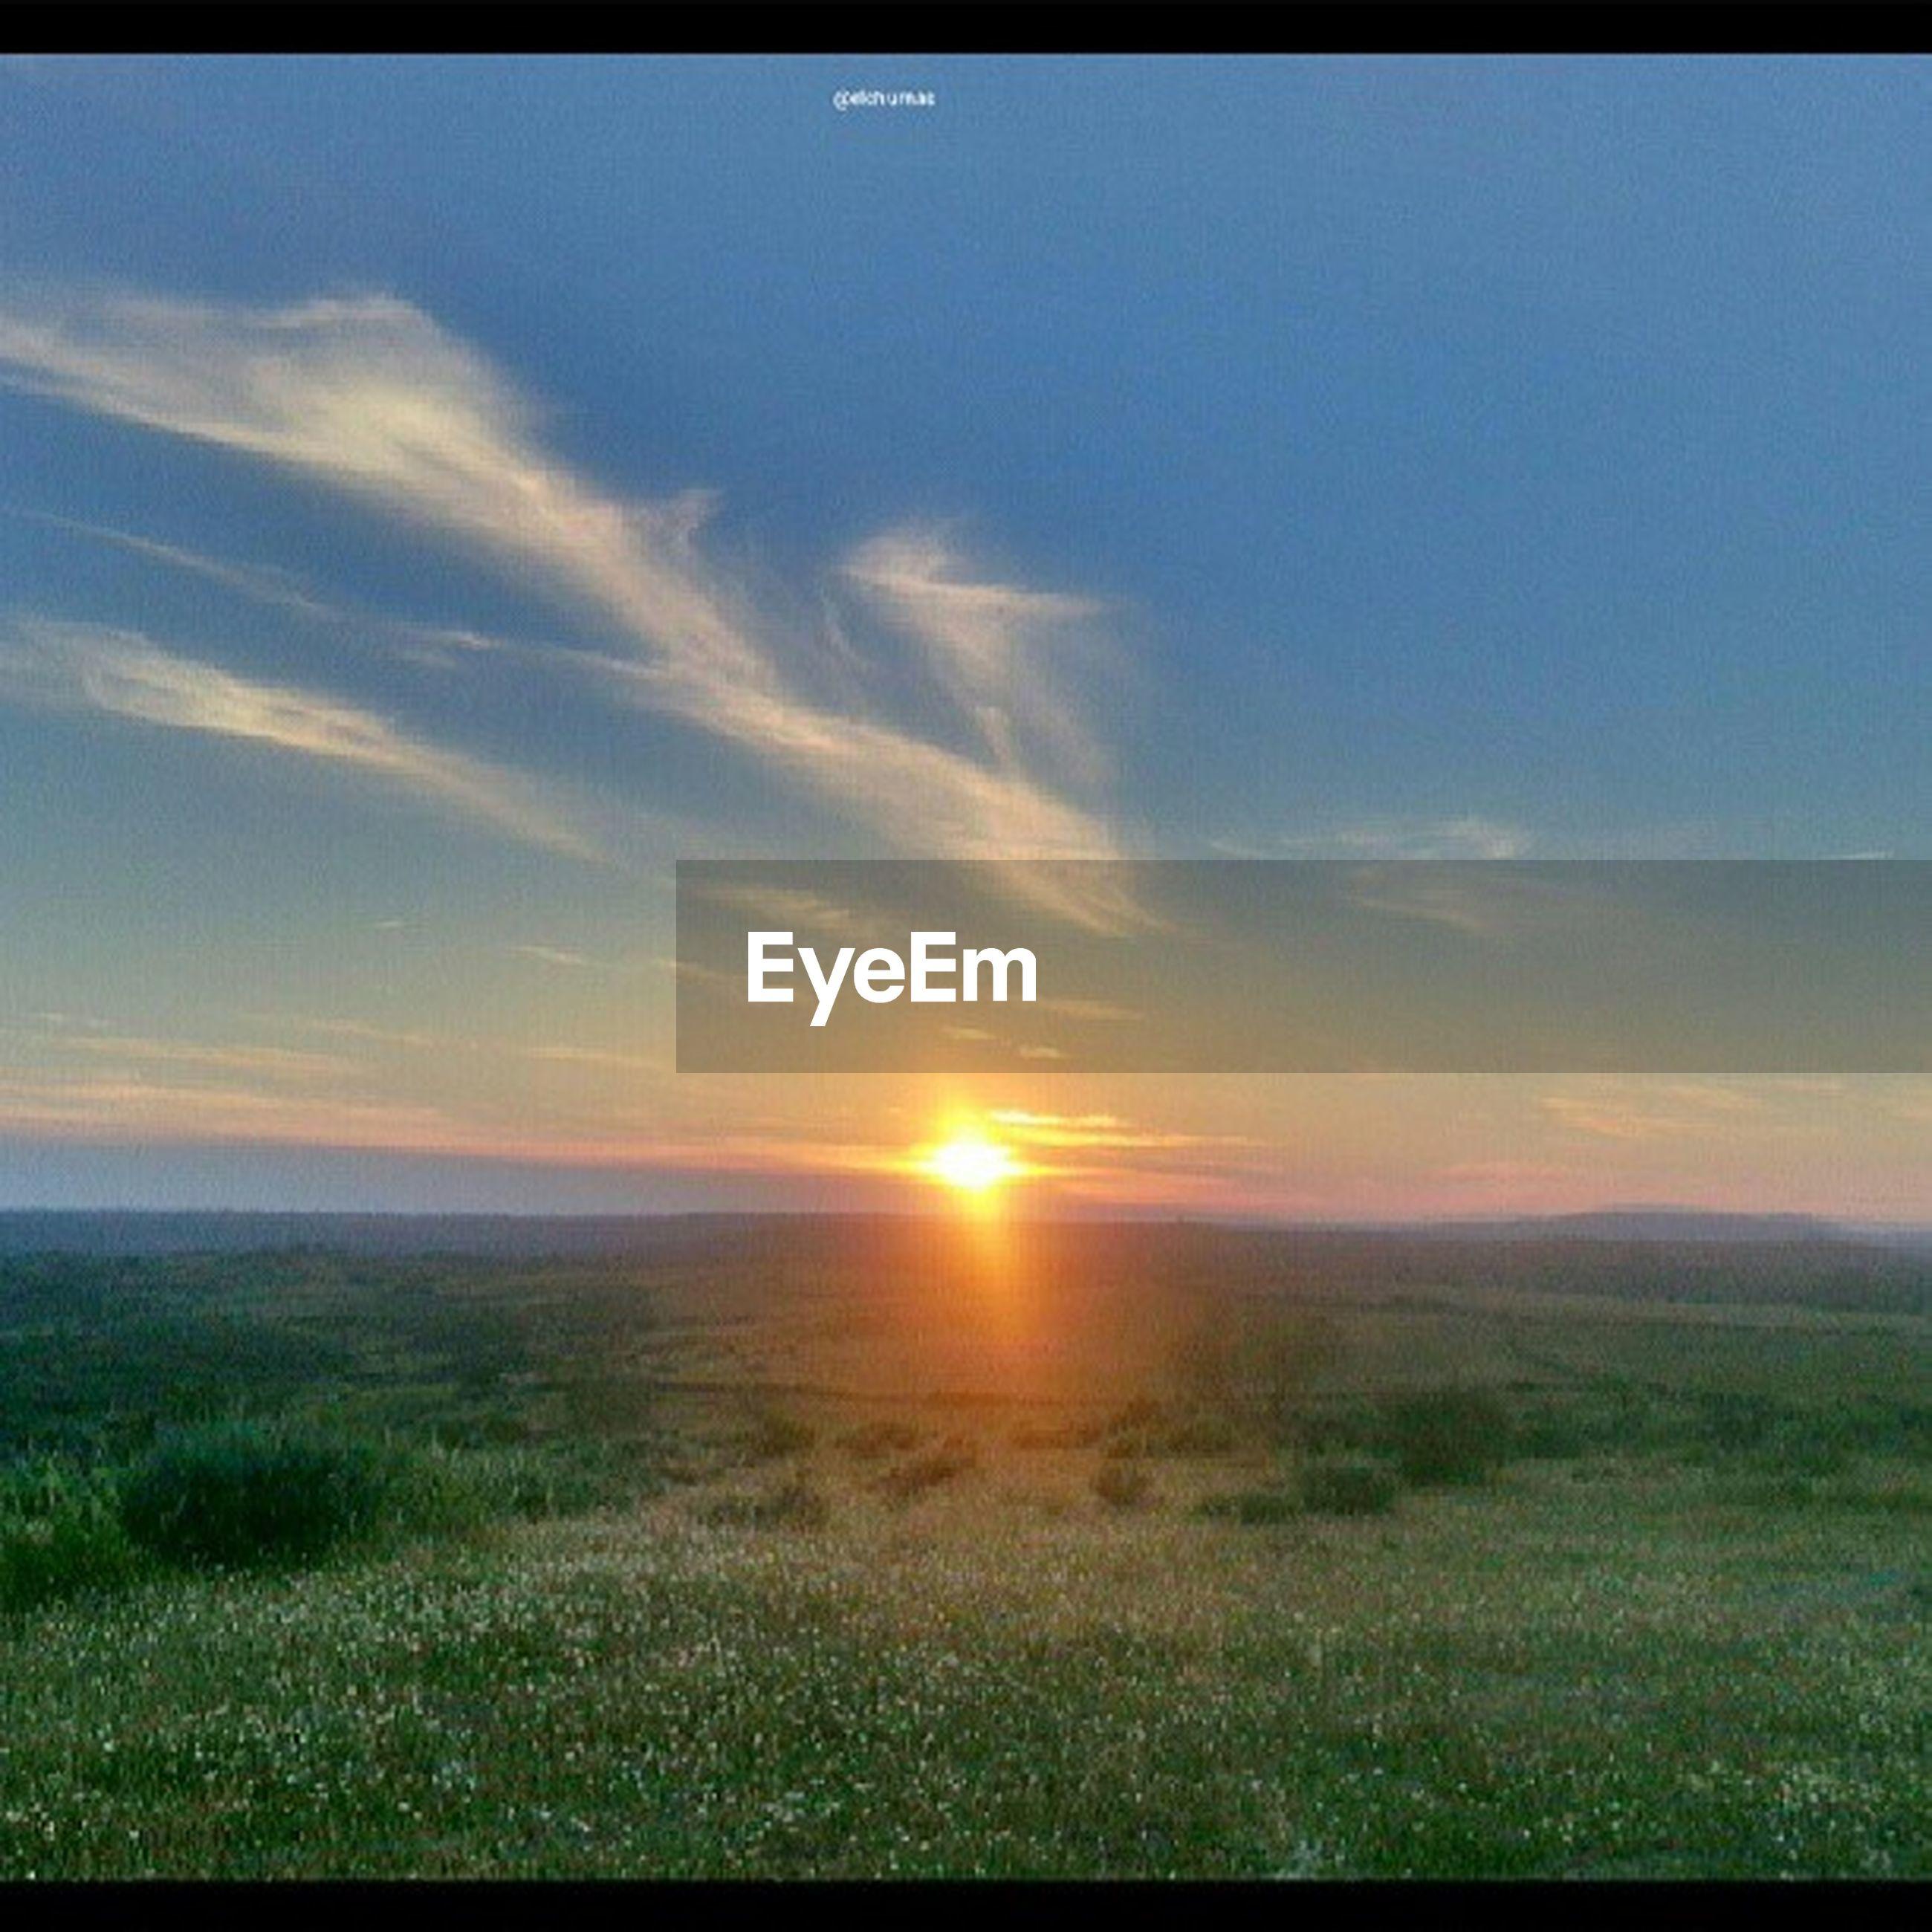 sun, sunset, tranquil scene, scenics, tranquility, beauty in nature, sky, landscape, grass, sunlight, nature, field, sunbeam, idyllic, lens flare, orange color, horizon over land, cloud - sky, grassy, non-urban scene